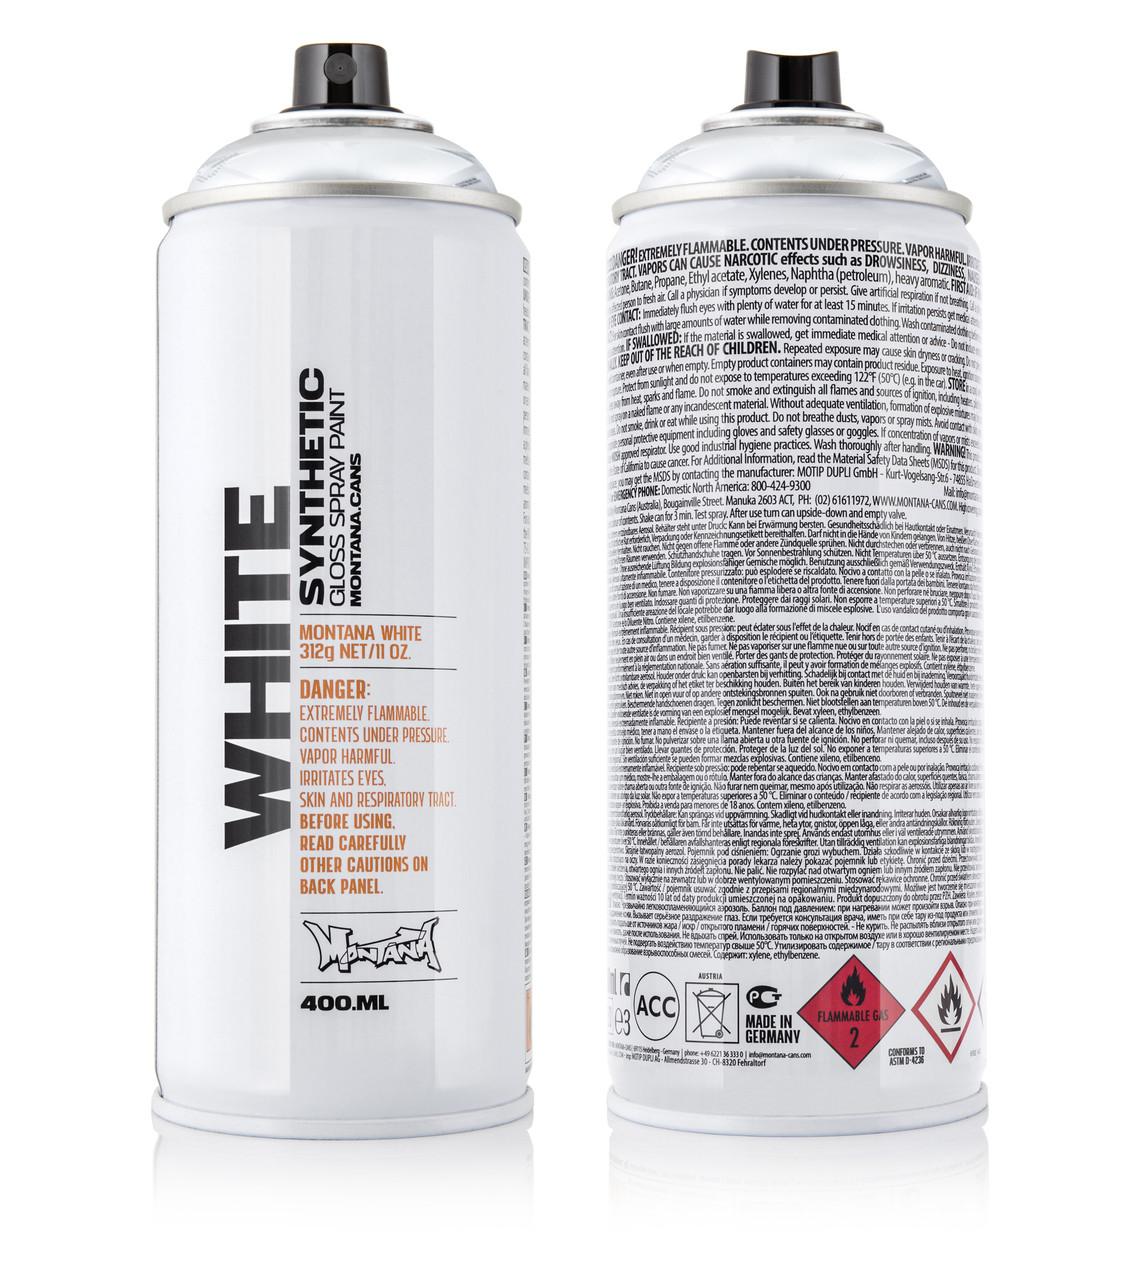 Краска Montana WHT Серебряный 400 мл (Silver) (280412)